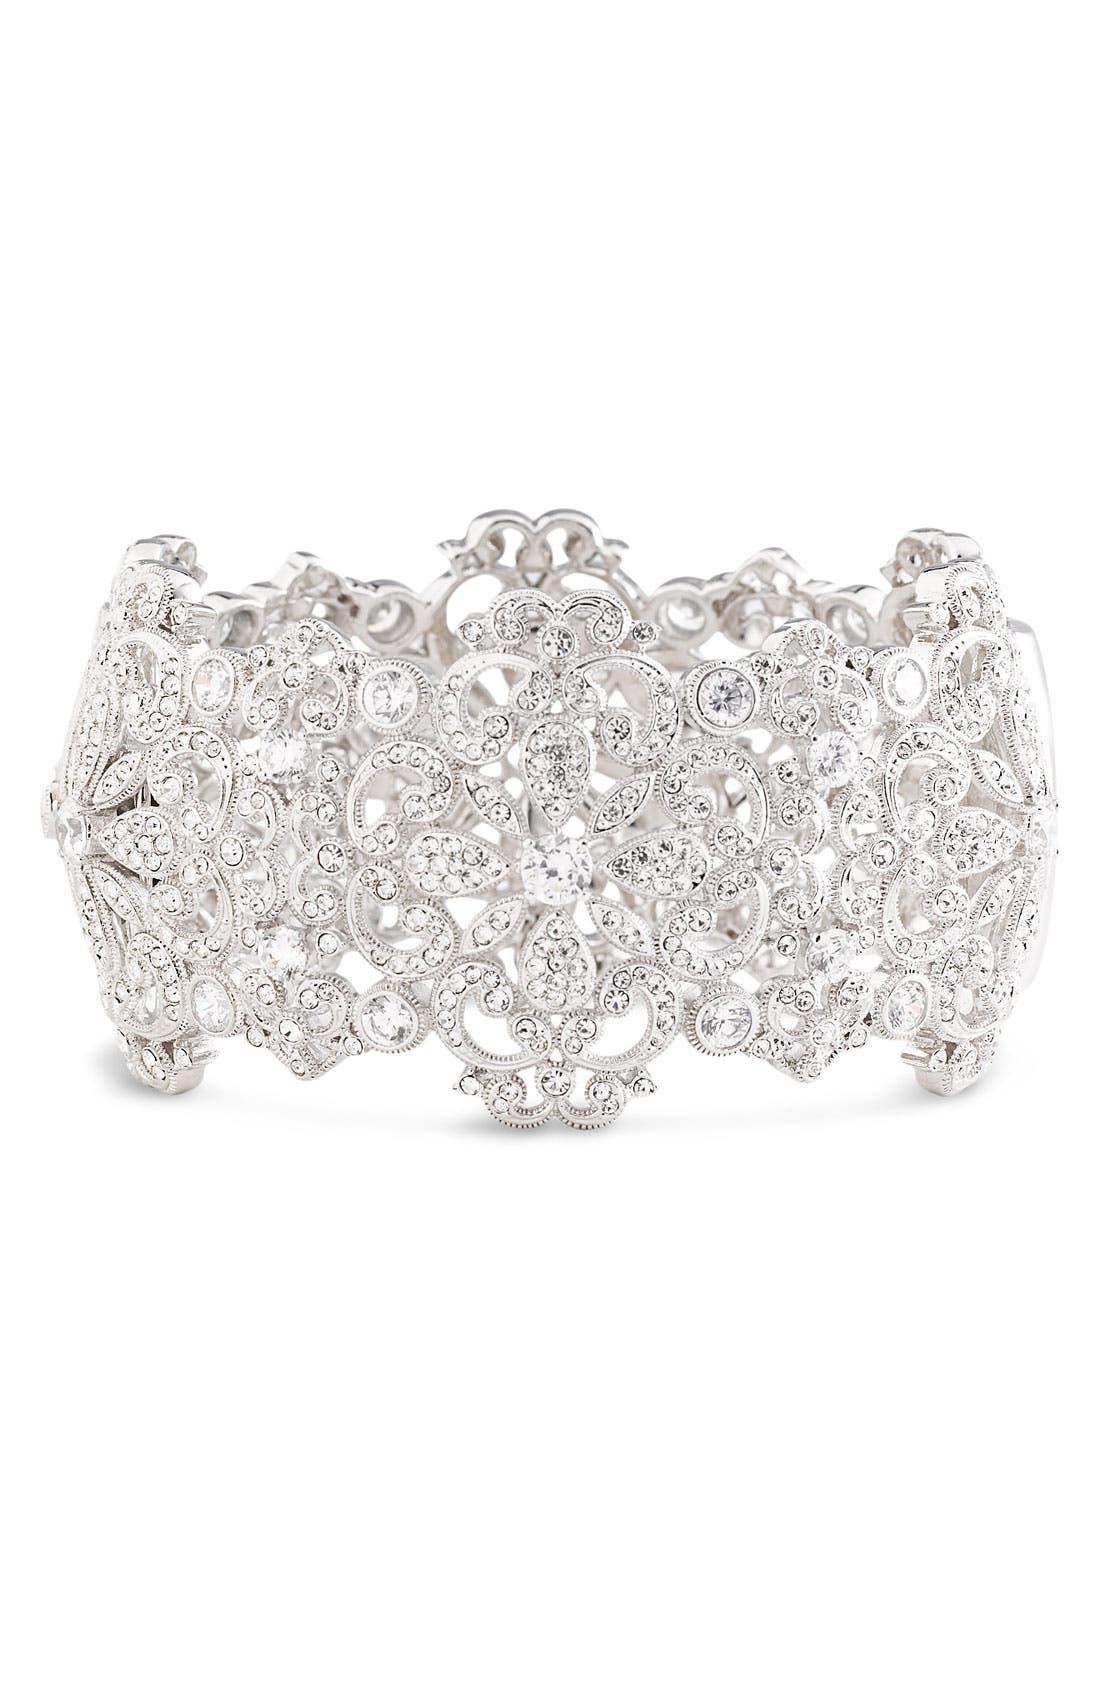 Main Image - Nadri Filigree Cuff Bracelet